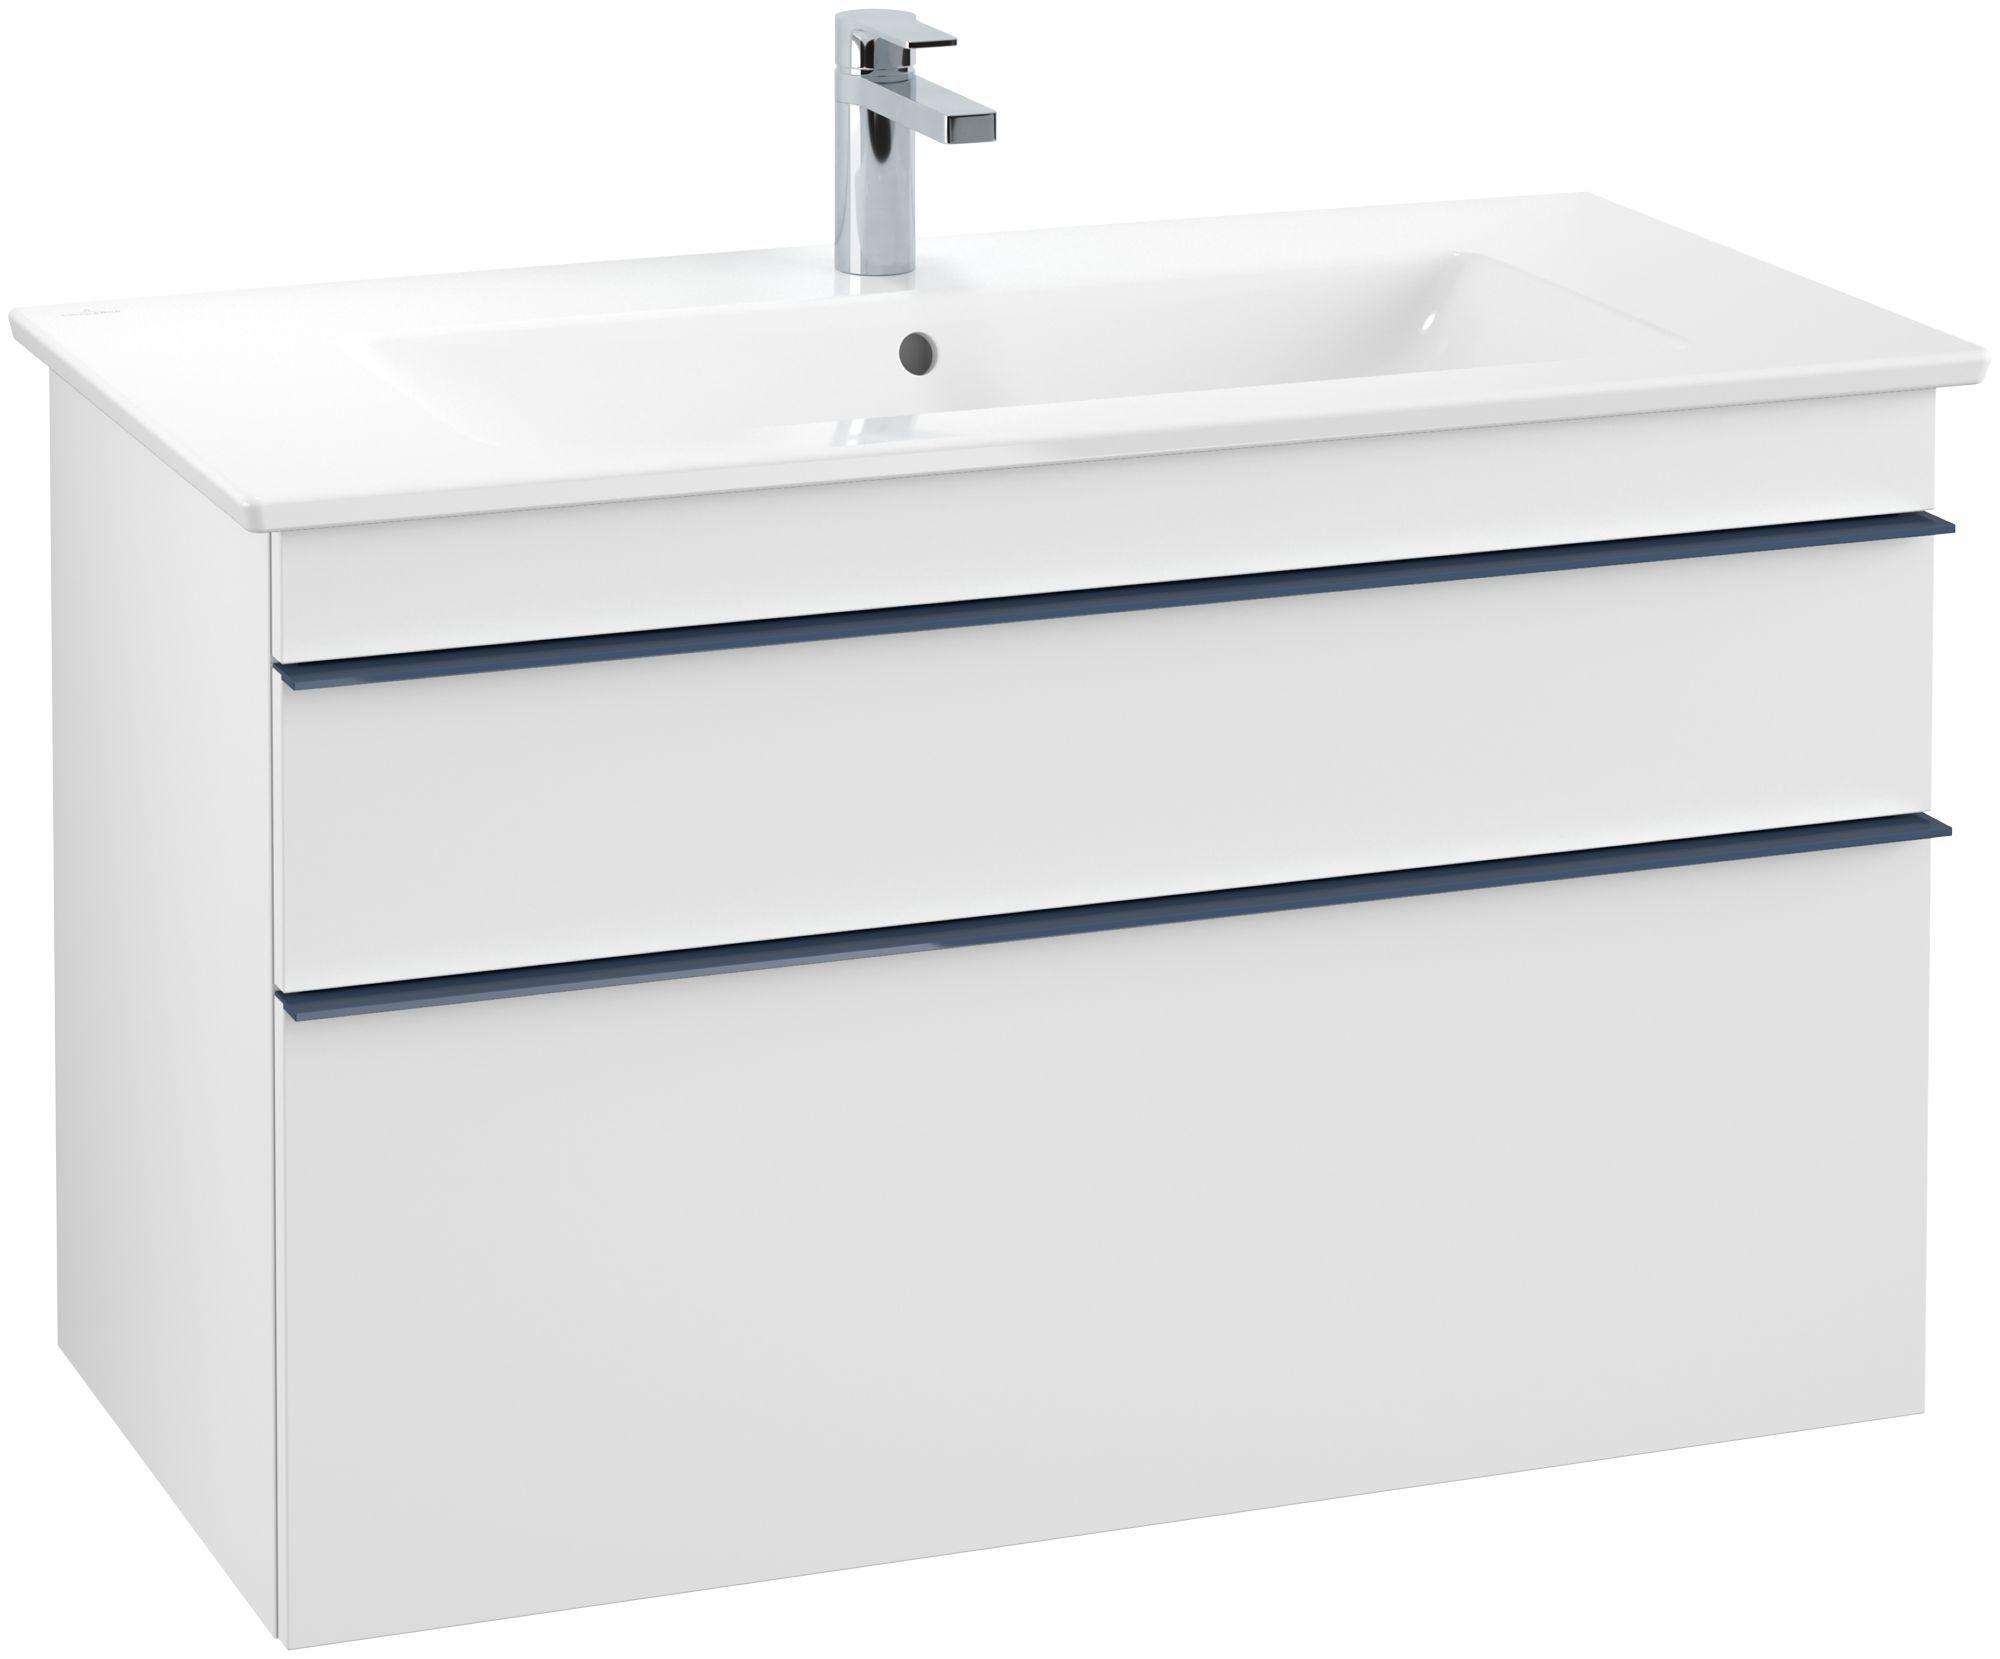 Villeroy & Boch Venticello Waschtischunterschrank 2 Auszüge B:953xT:502xH:590mm weiß matt Griffe blau A92604MS